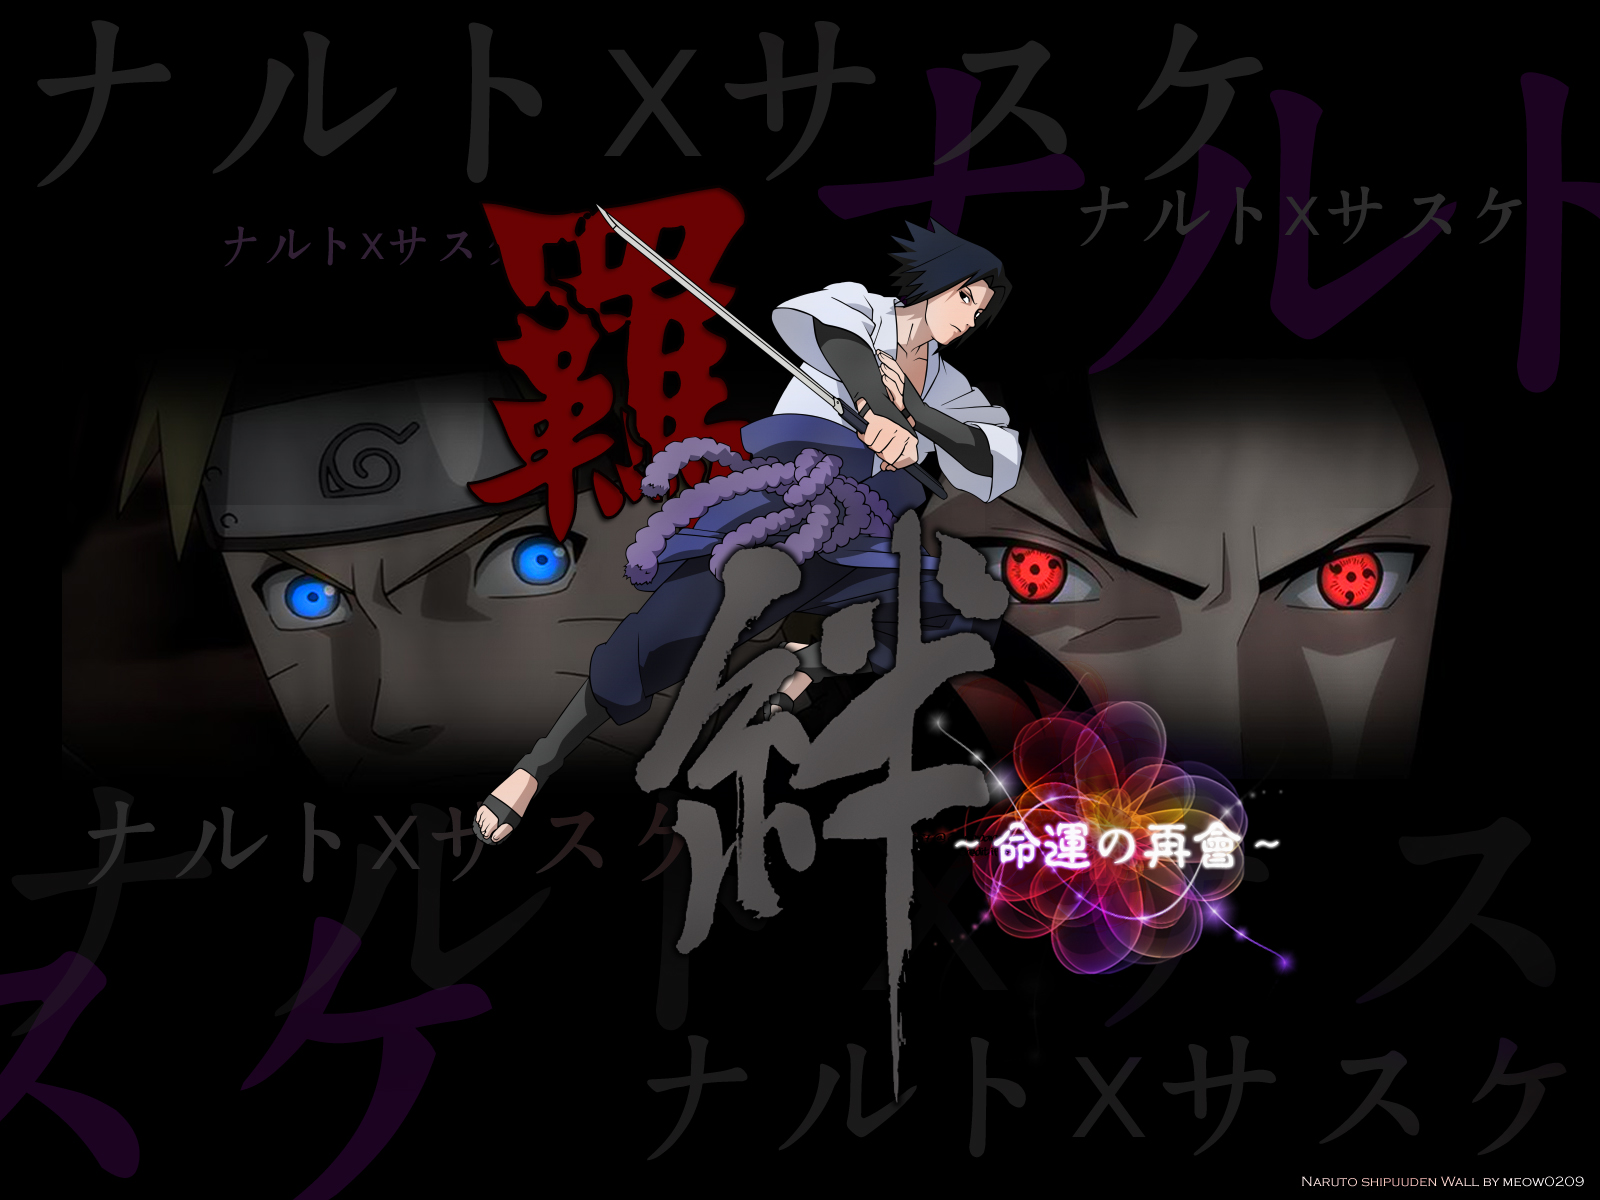 Yo amo el anime imagenes anime hd wallpapers for Imagenes anime hd full